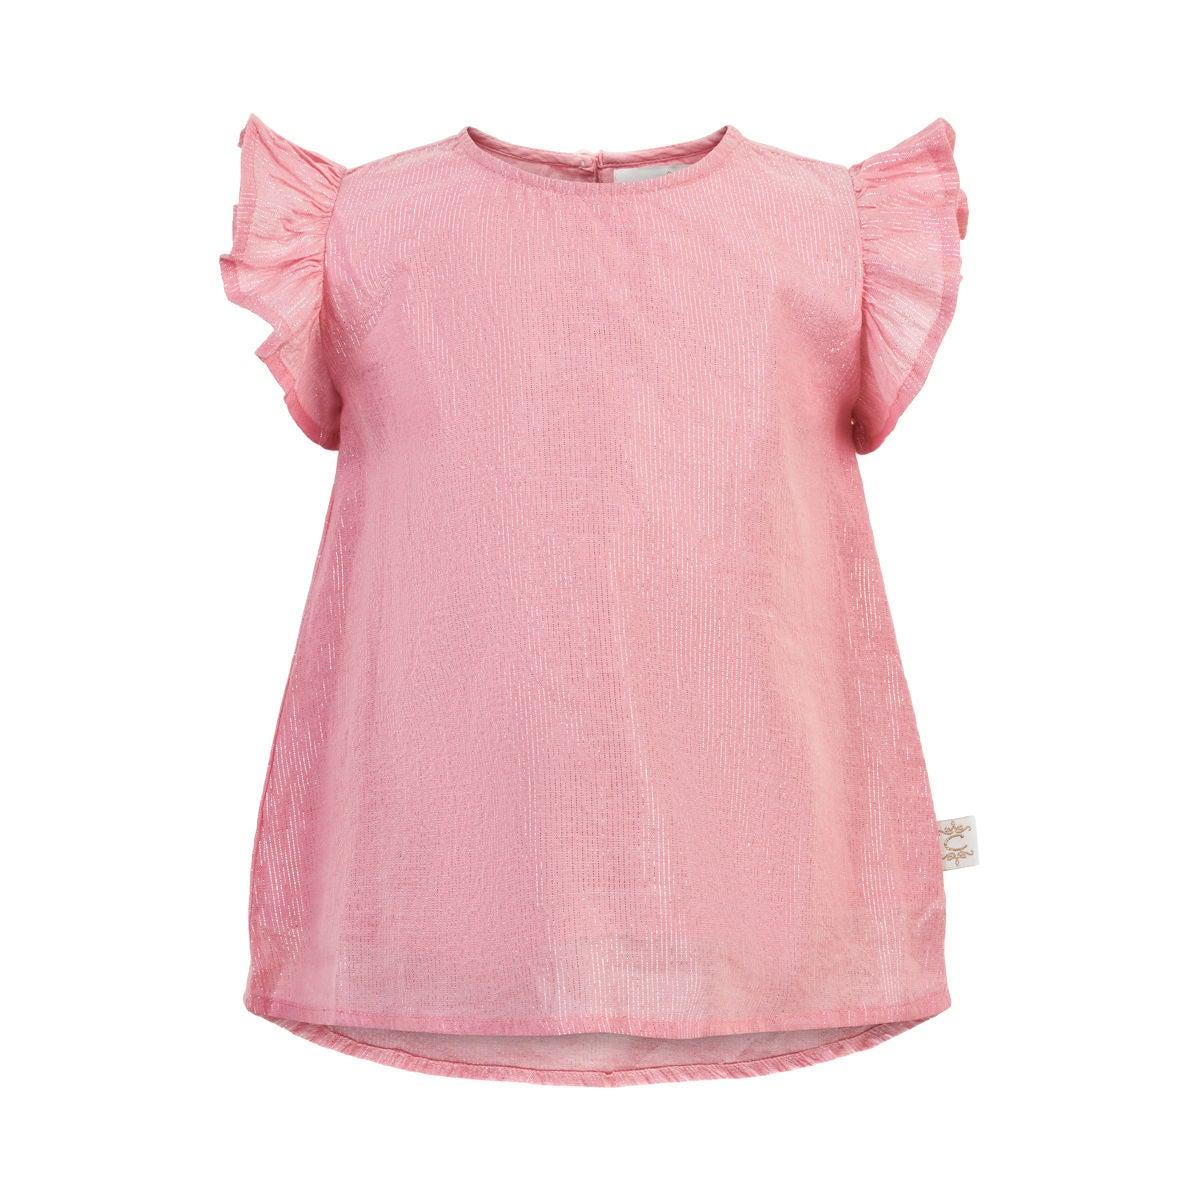 Creamie Blus, Pink Icing, 104